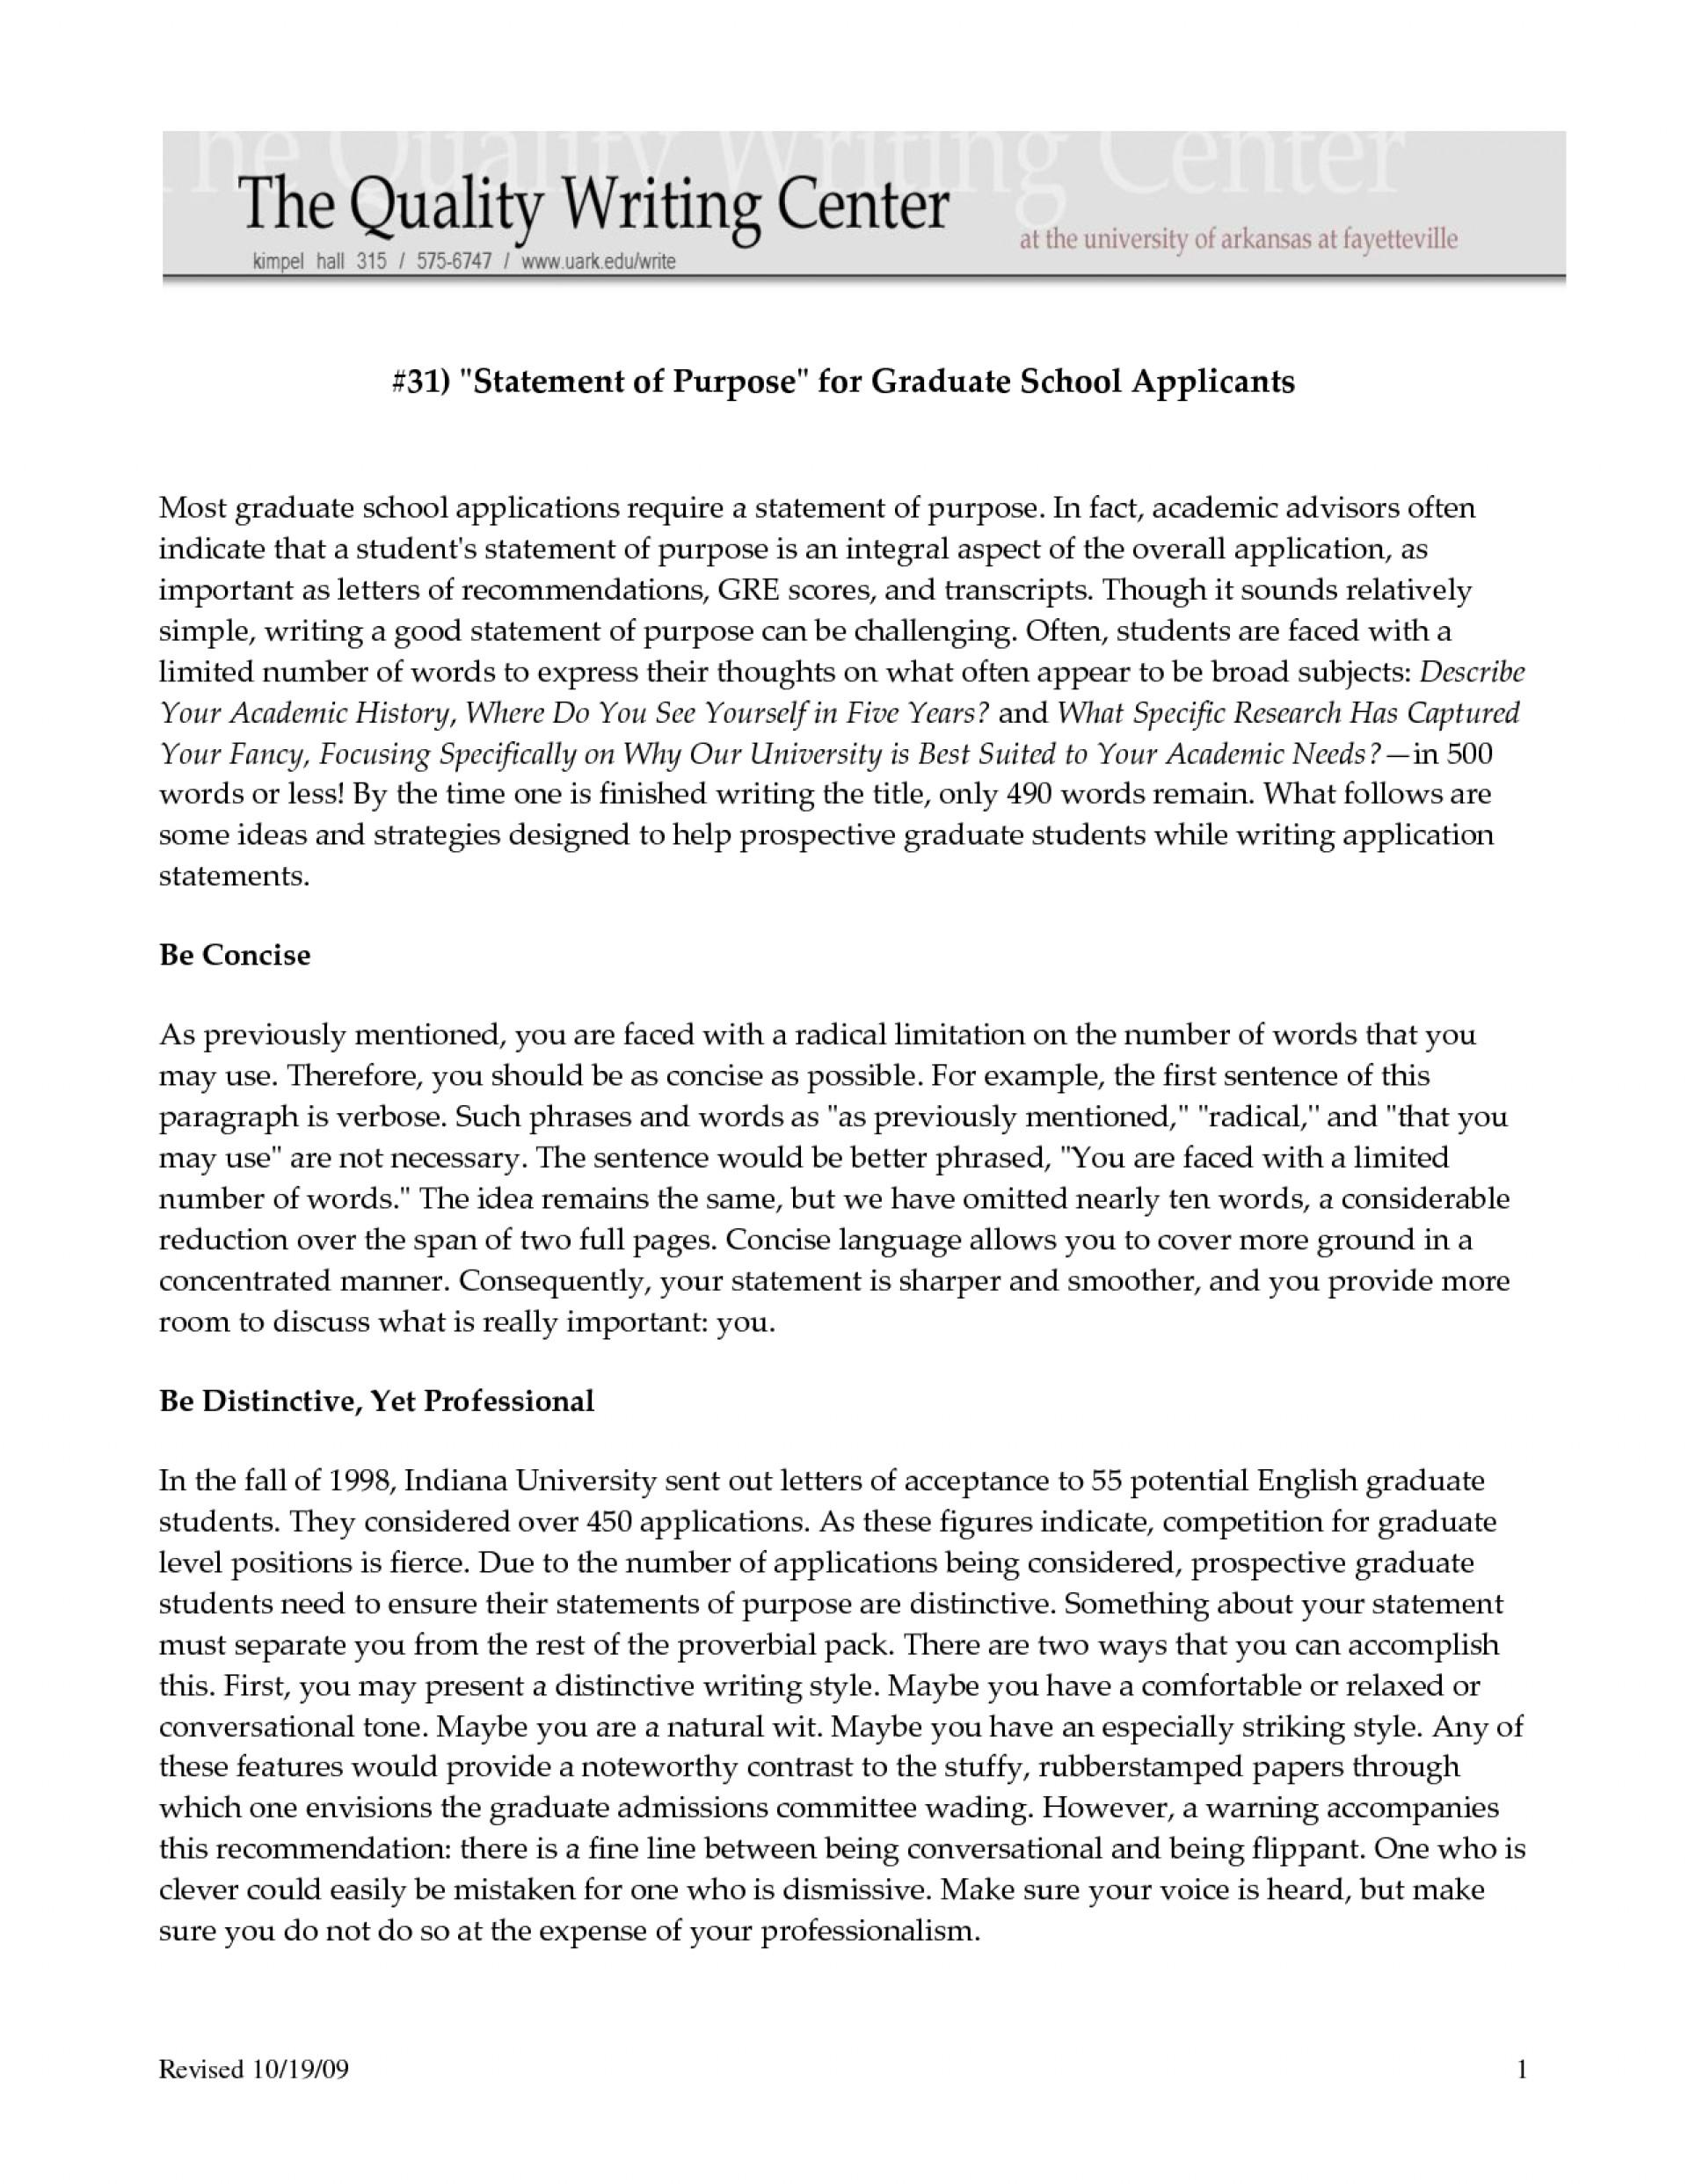 001 Essay Example Statement Of Purpose Graduate School Sample Top Essays Examples Mba Nursing 1920